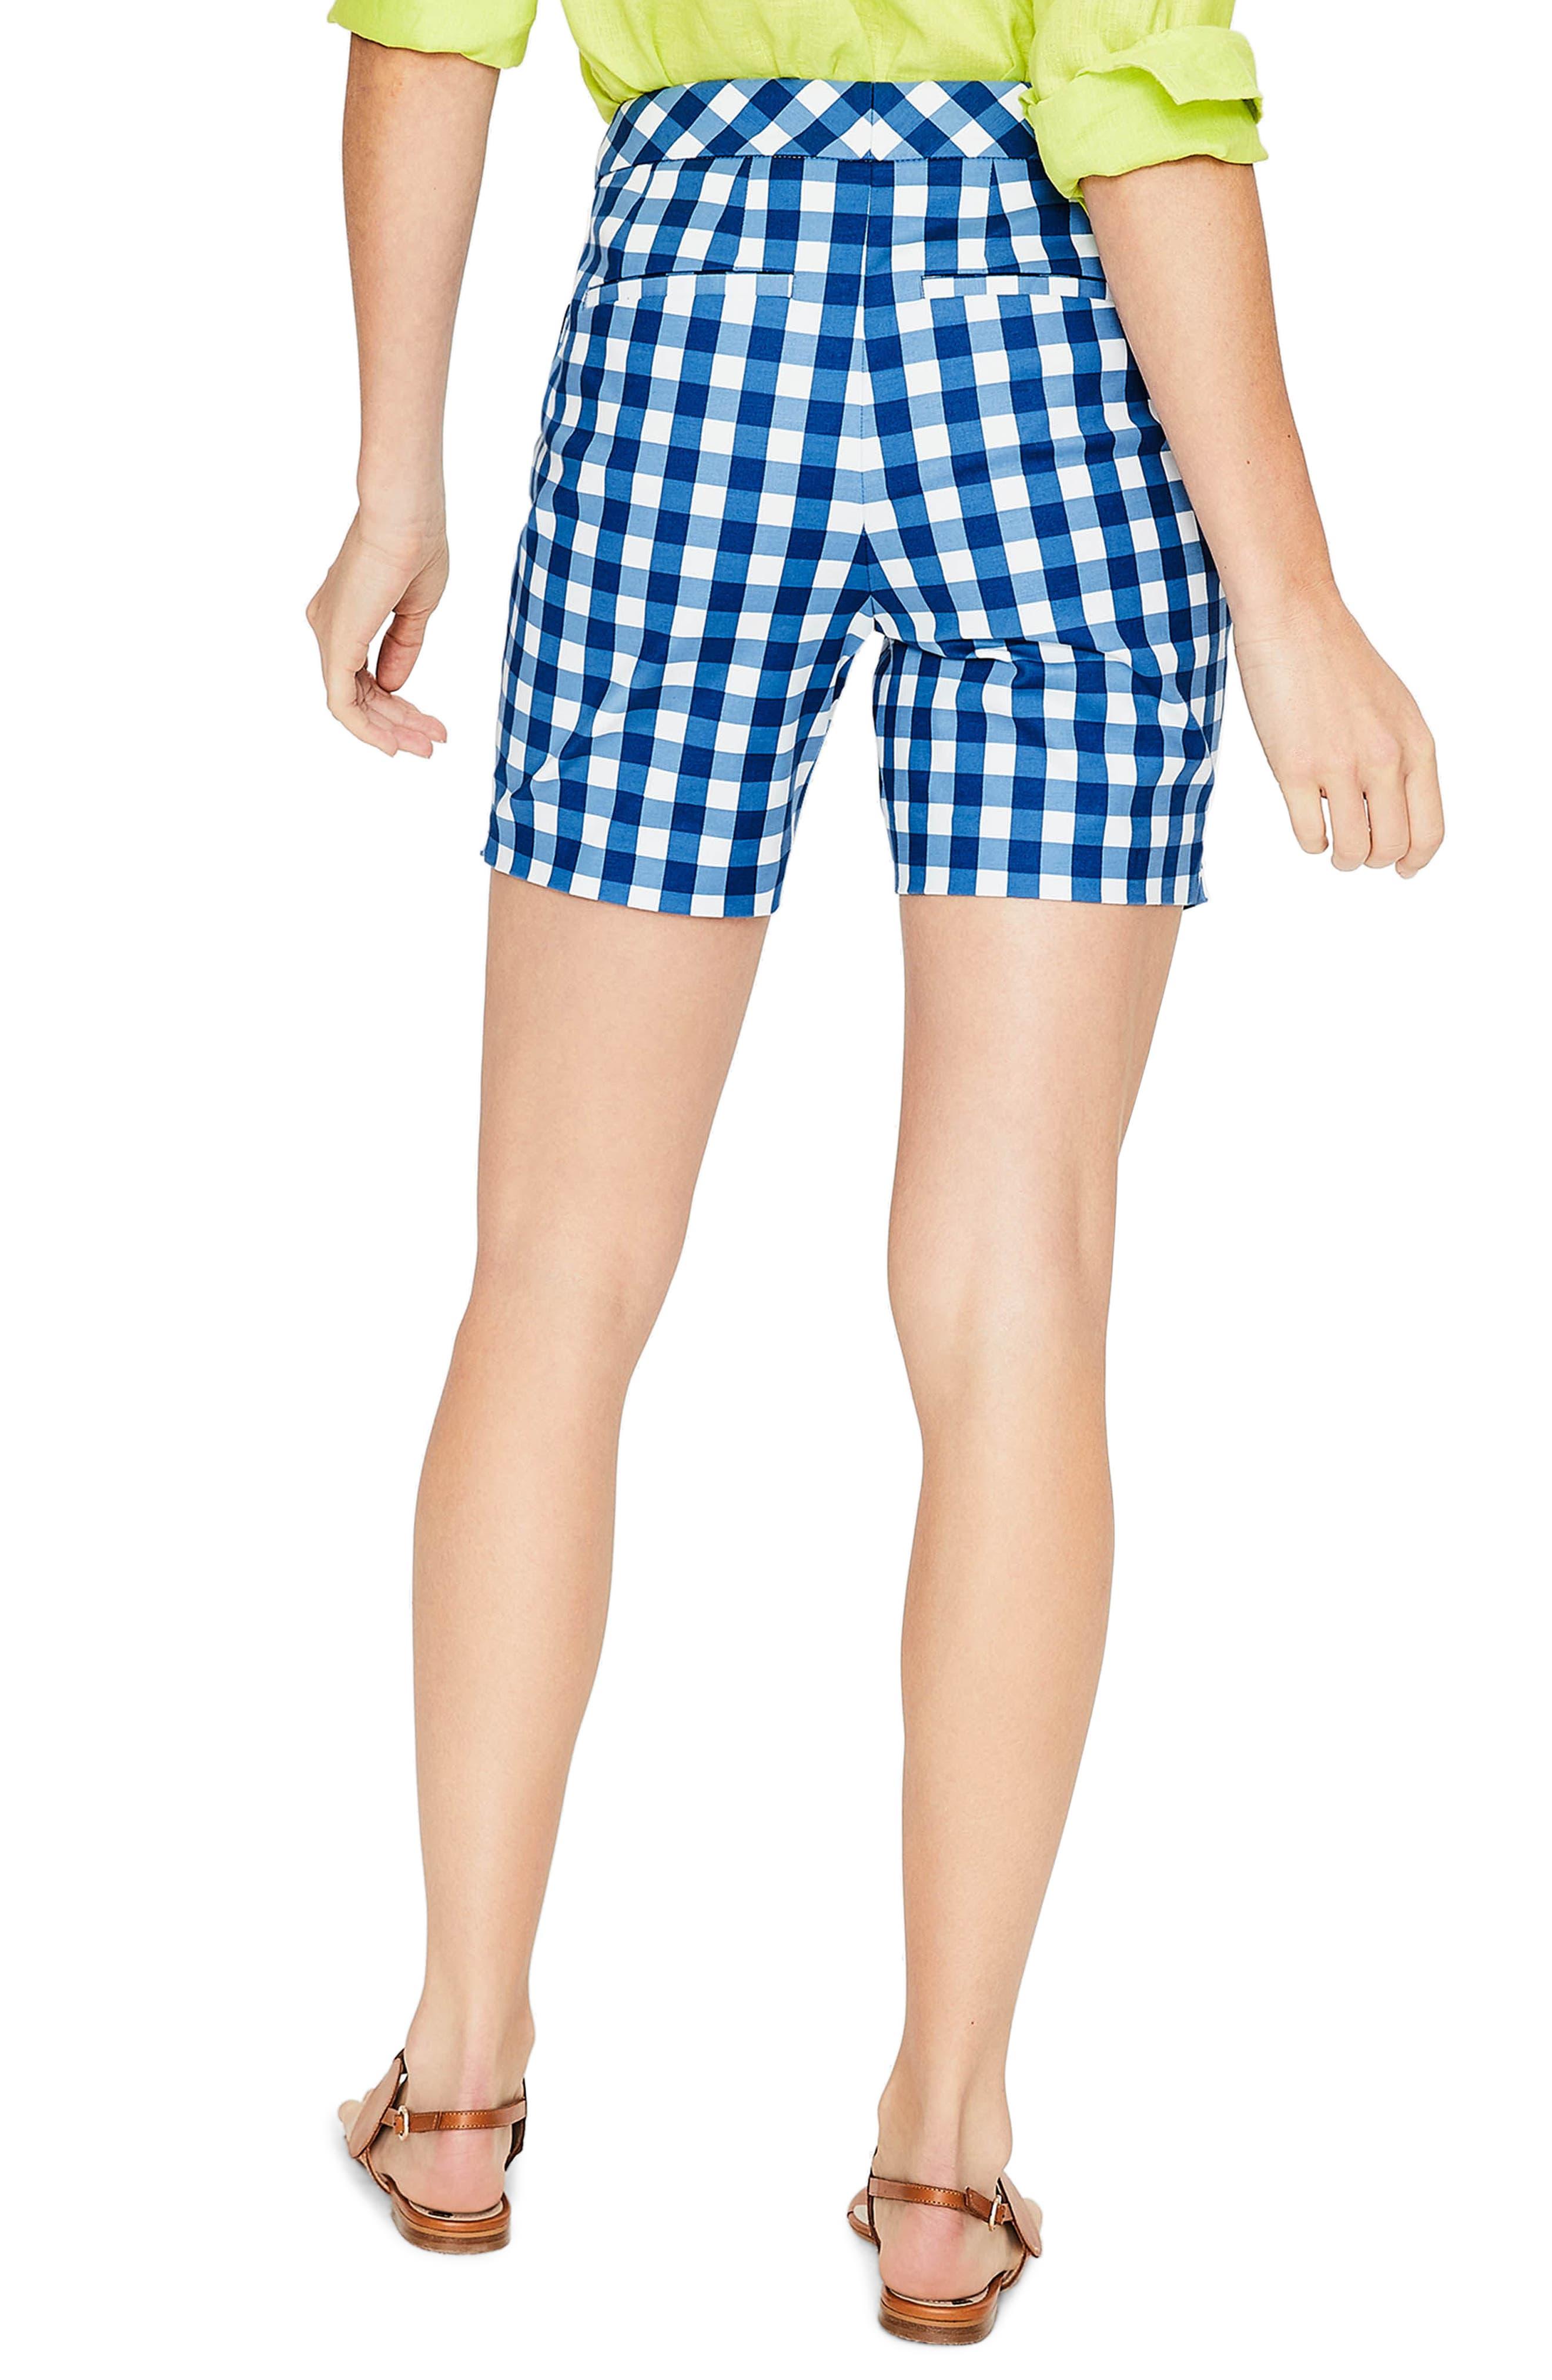 Richmond Check Shorts,                             Alternate thumbnail 2, color,                             Riviera Blue Gingham